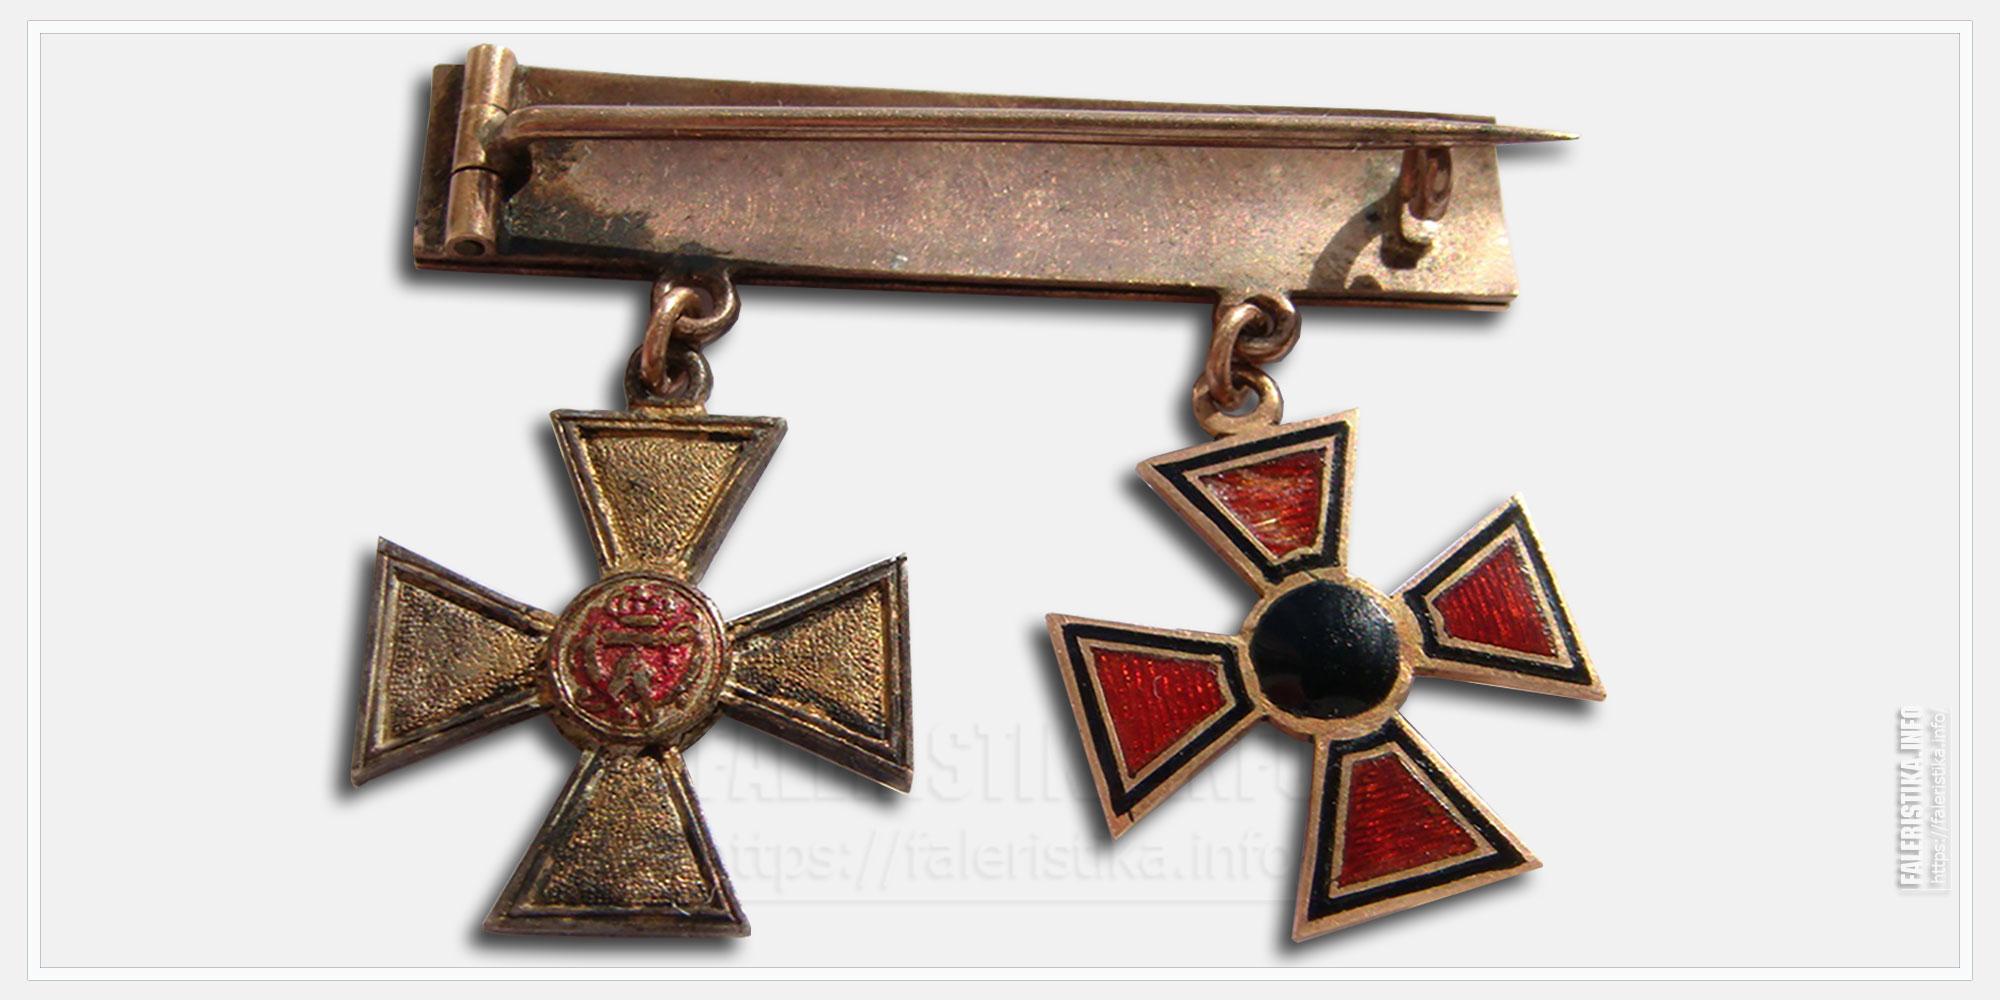 Знак Ордена Святого Владимира (миниатюра)